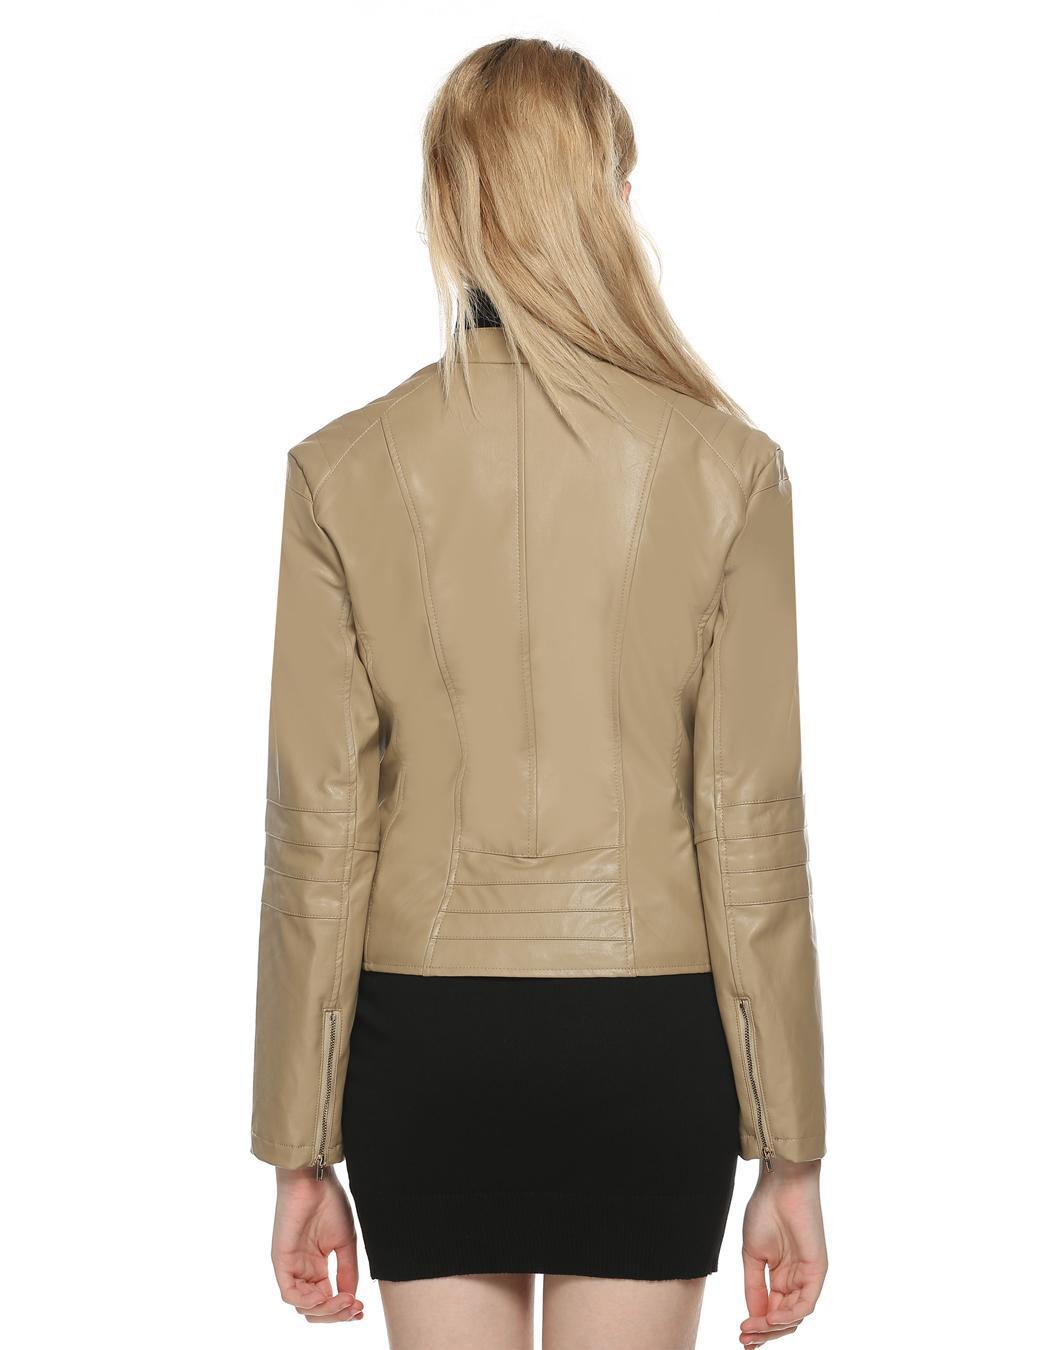 Women Long Sleeve Synthetic Leather Casual Bike Jacket Short Coat 4